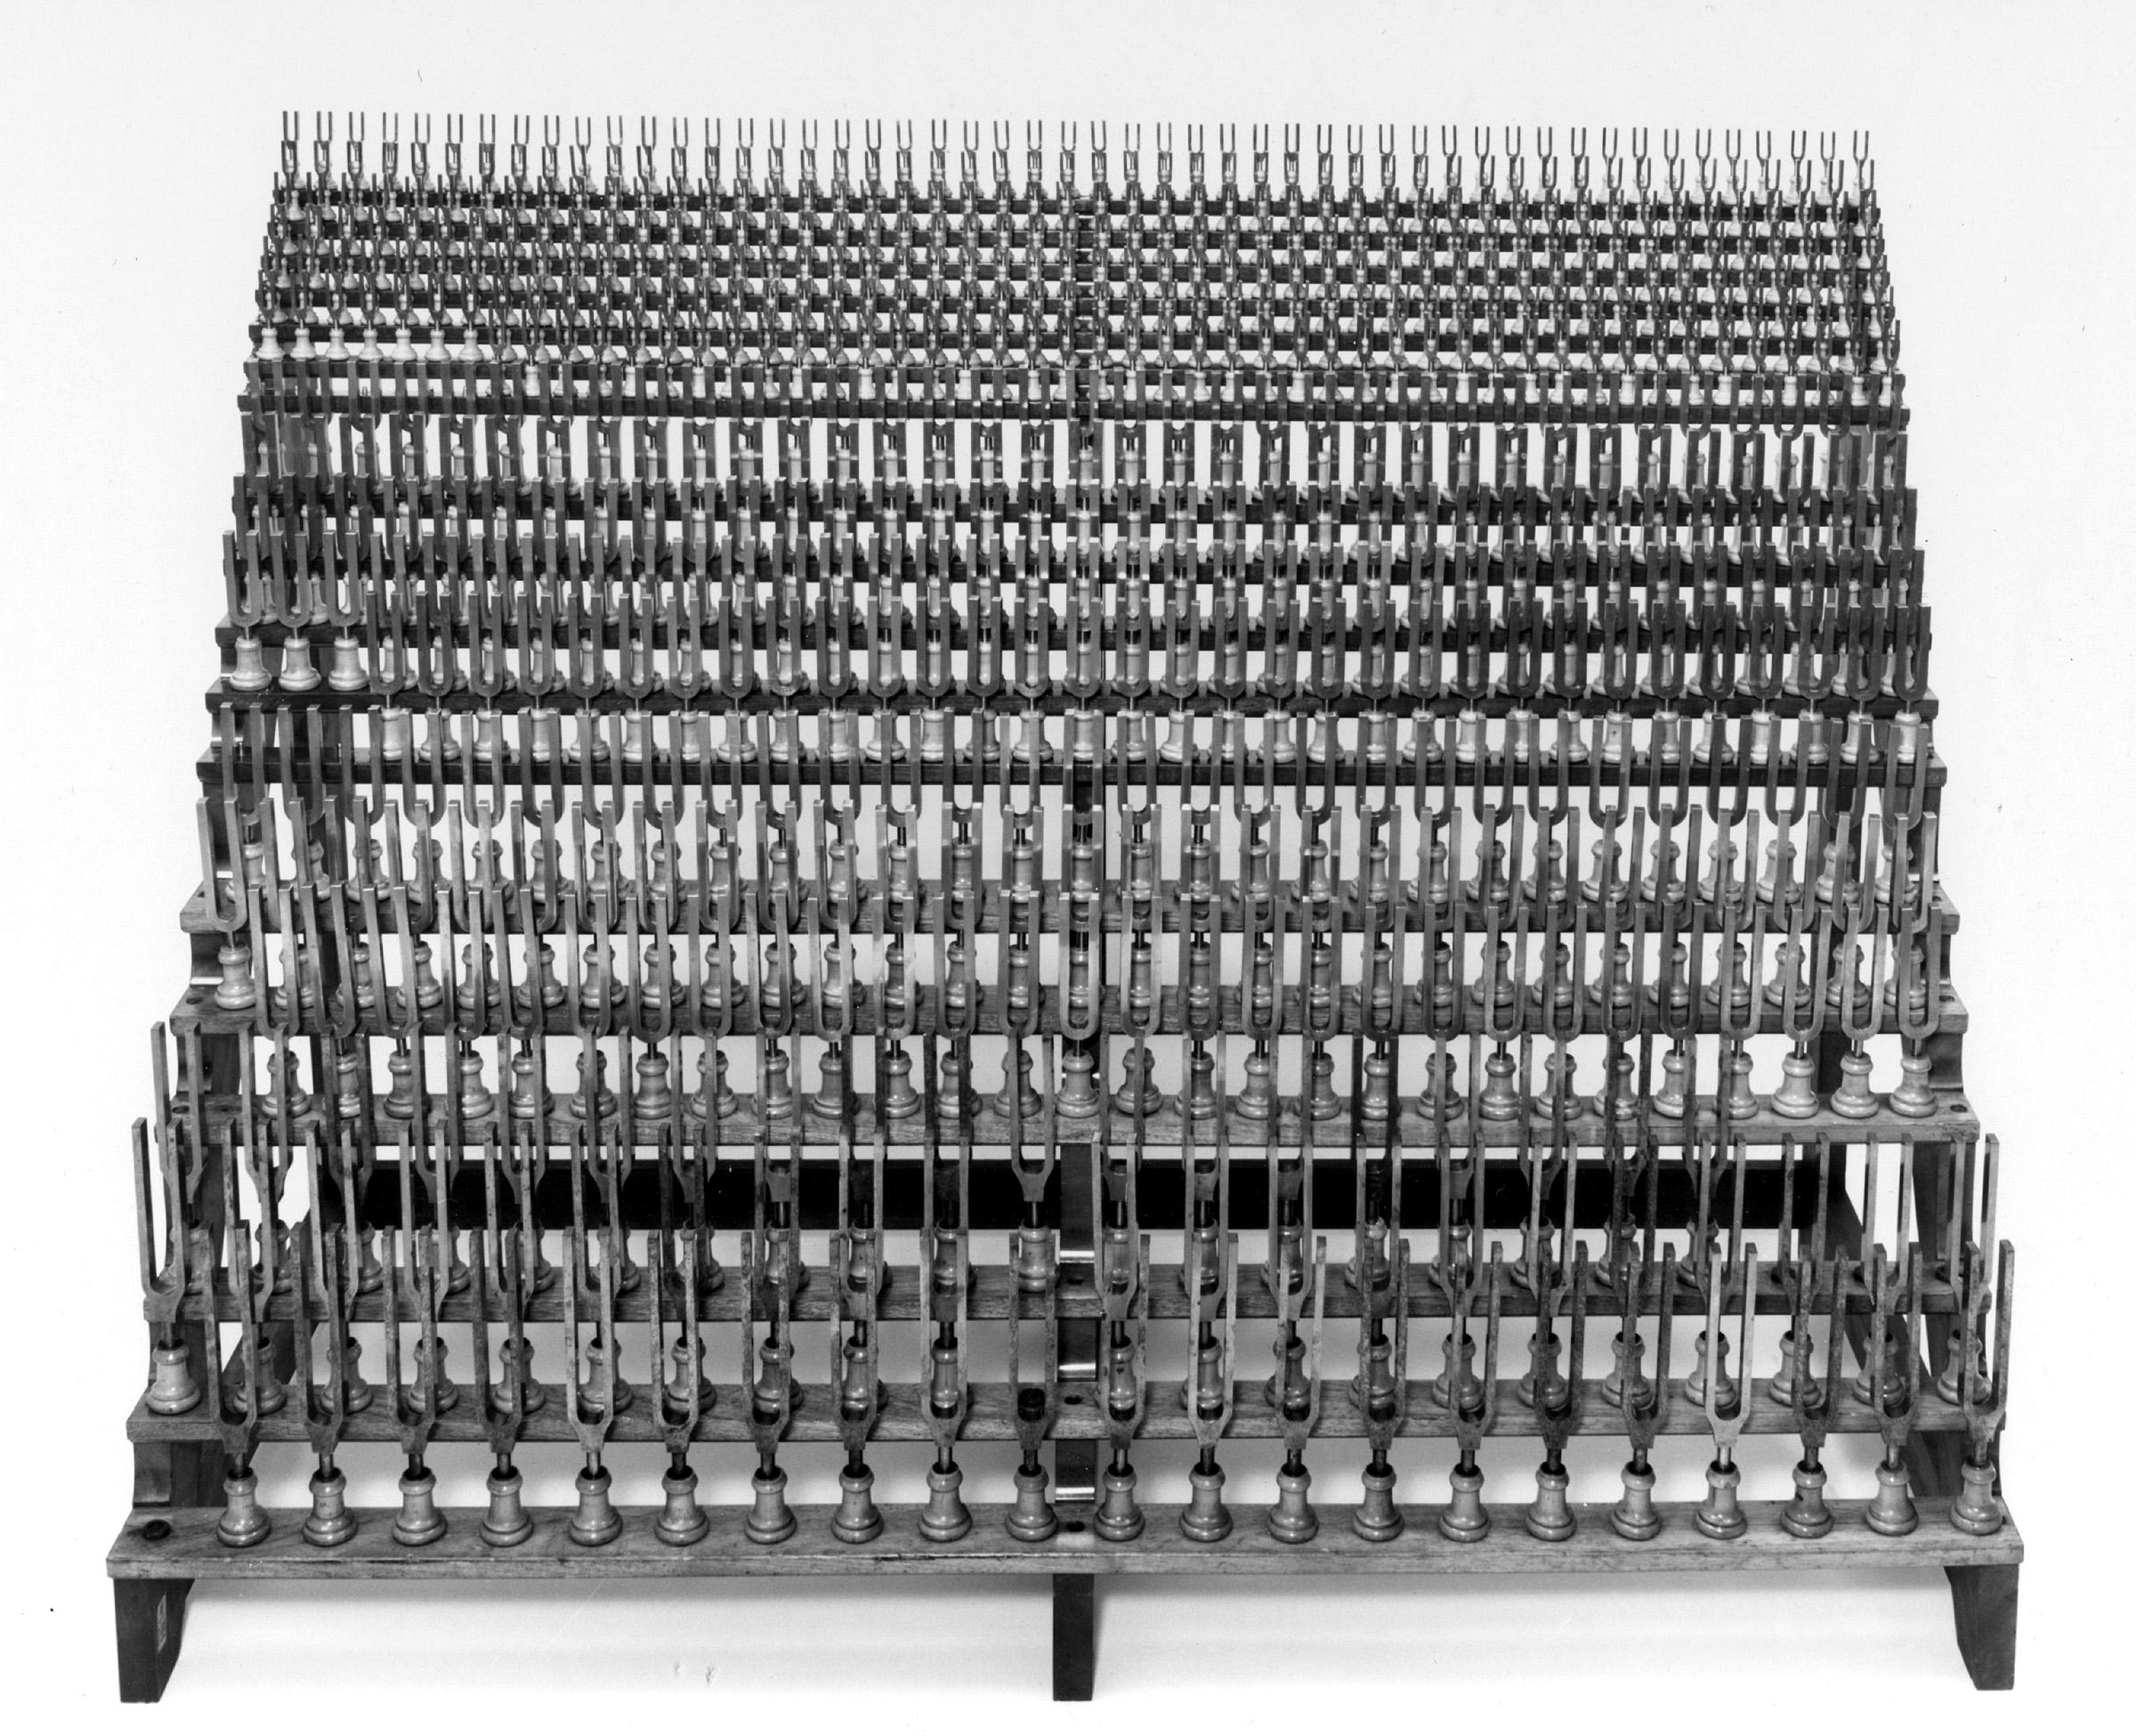 tuning forks Rudolph Koenig Tonometer